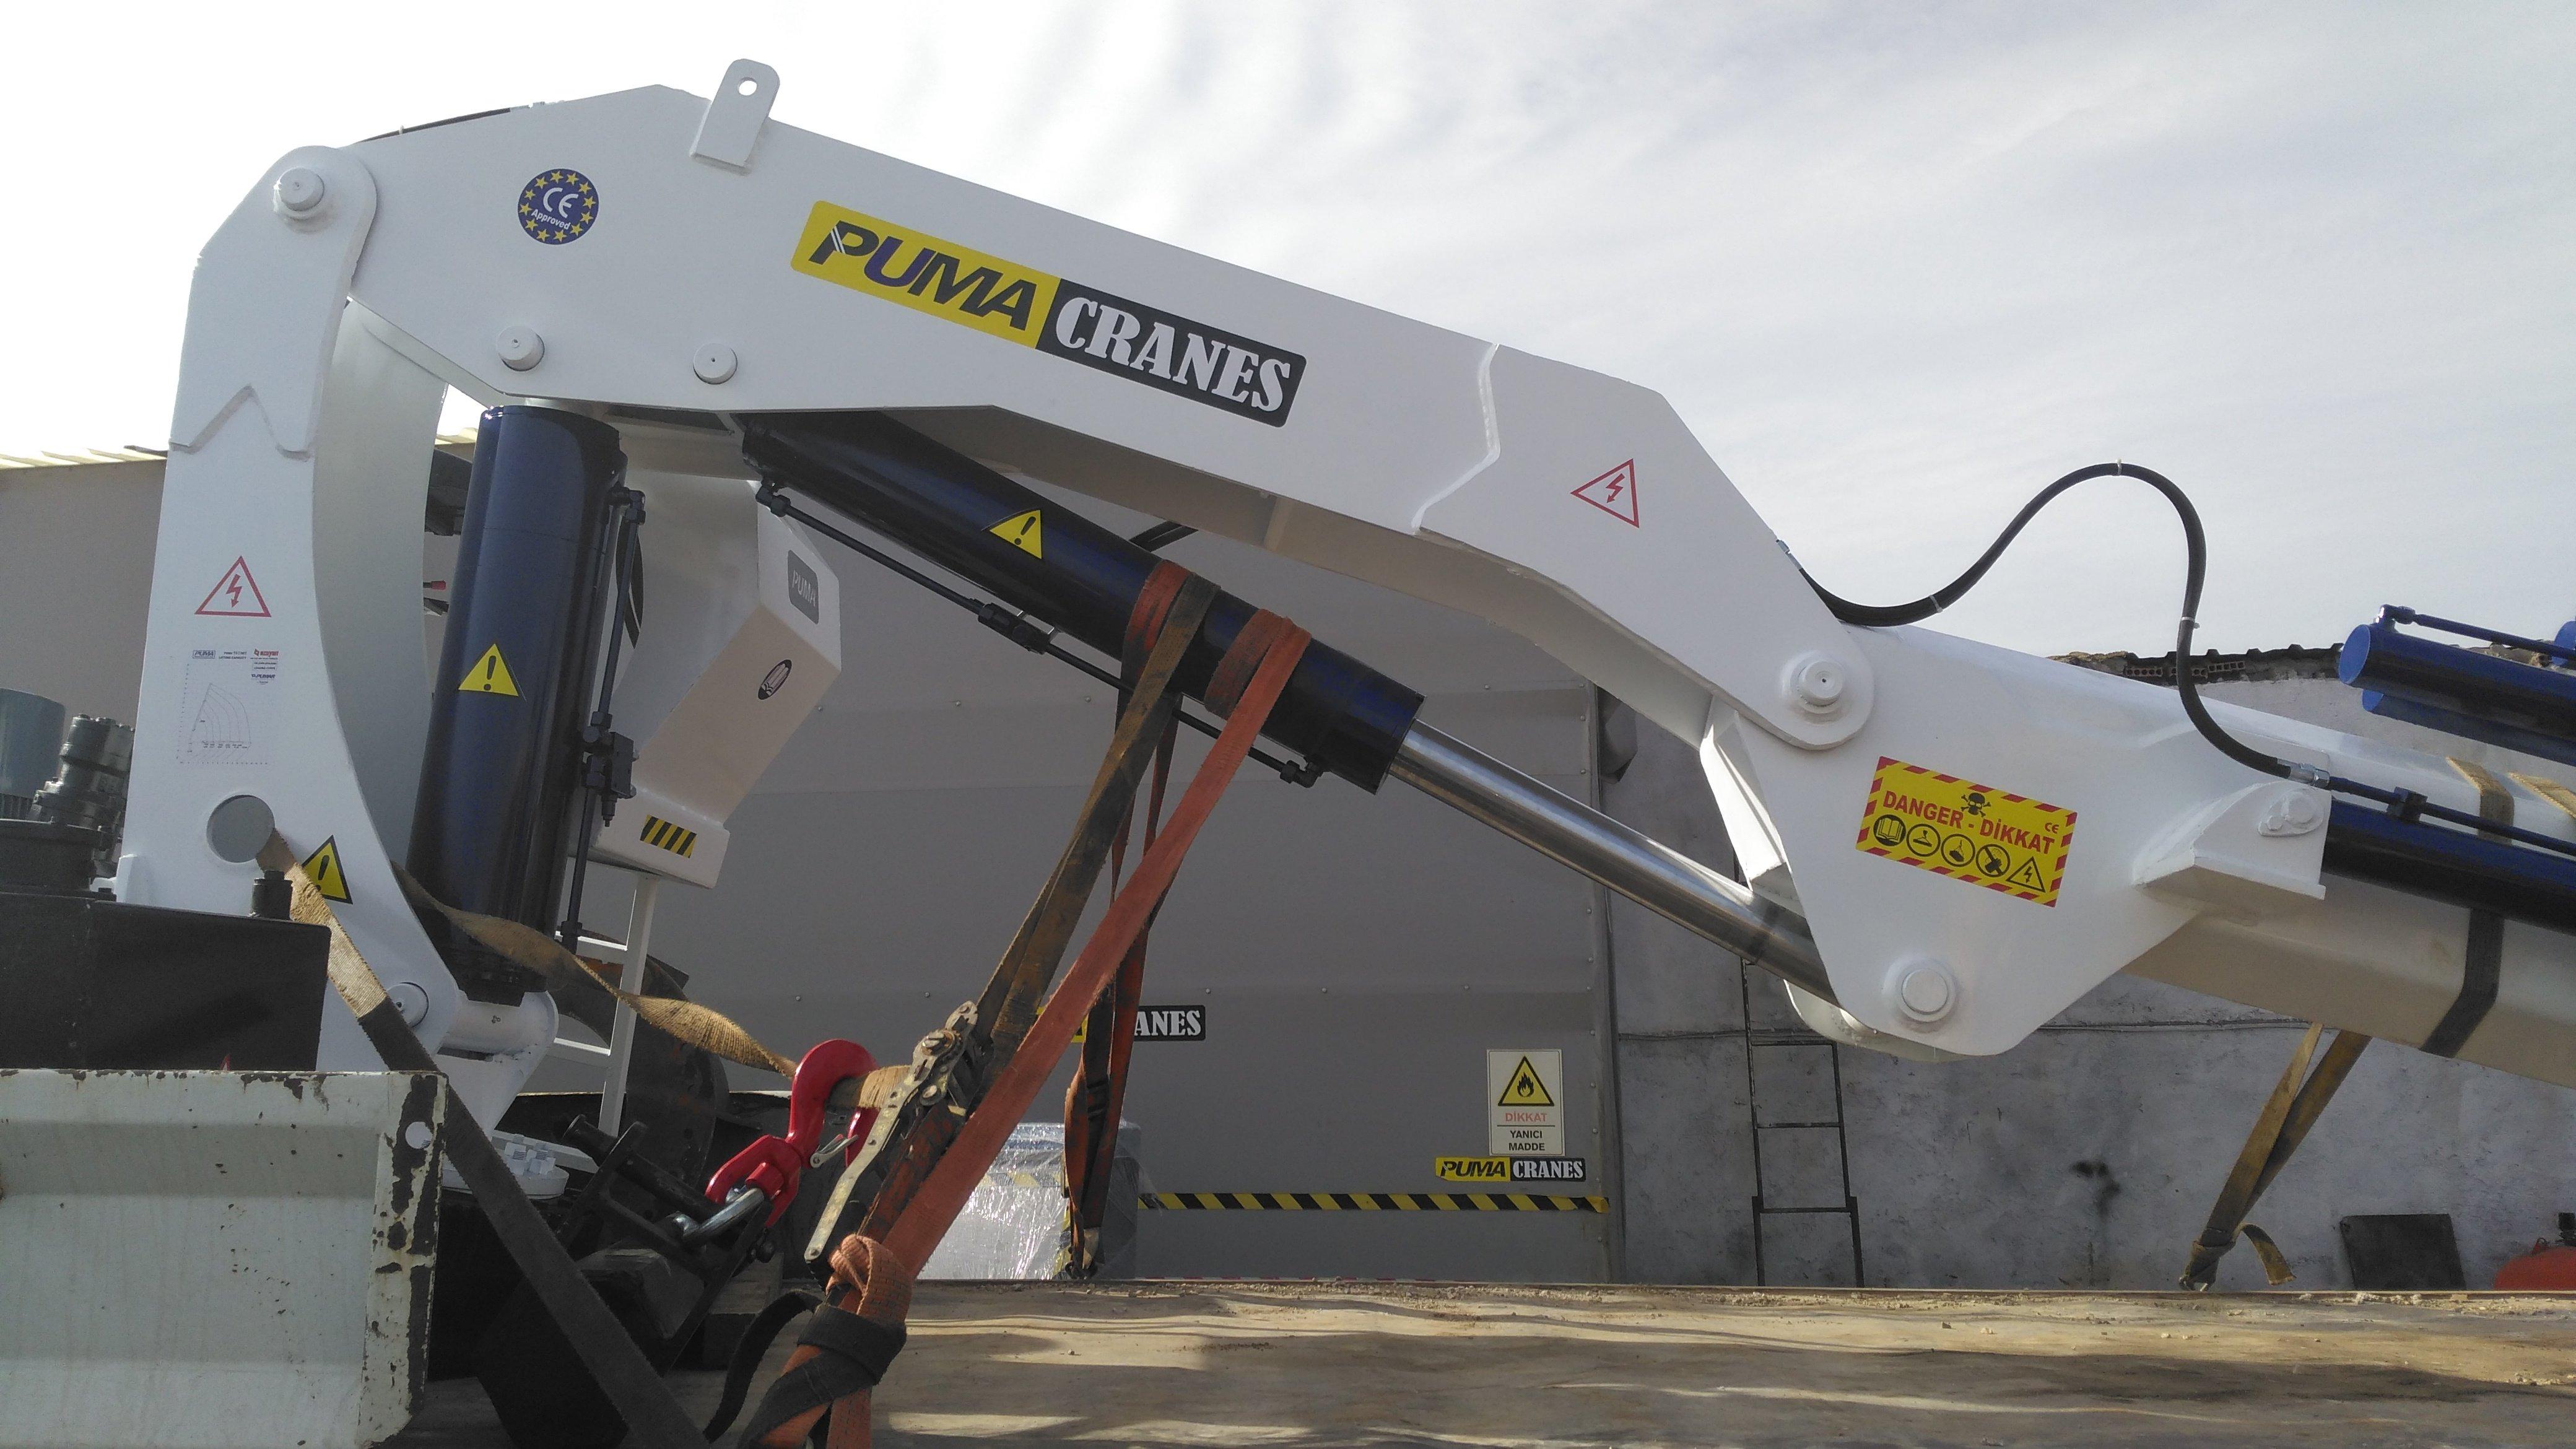 puma-marine-crane979033.jpg